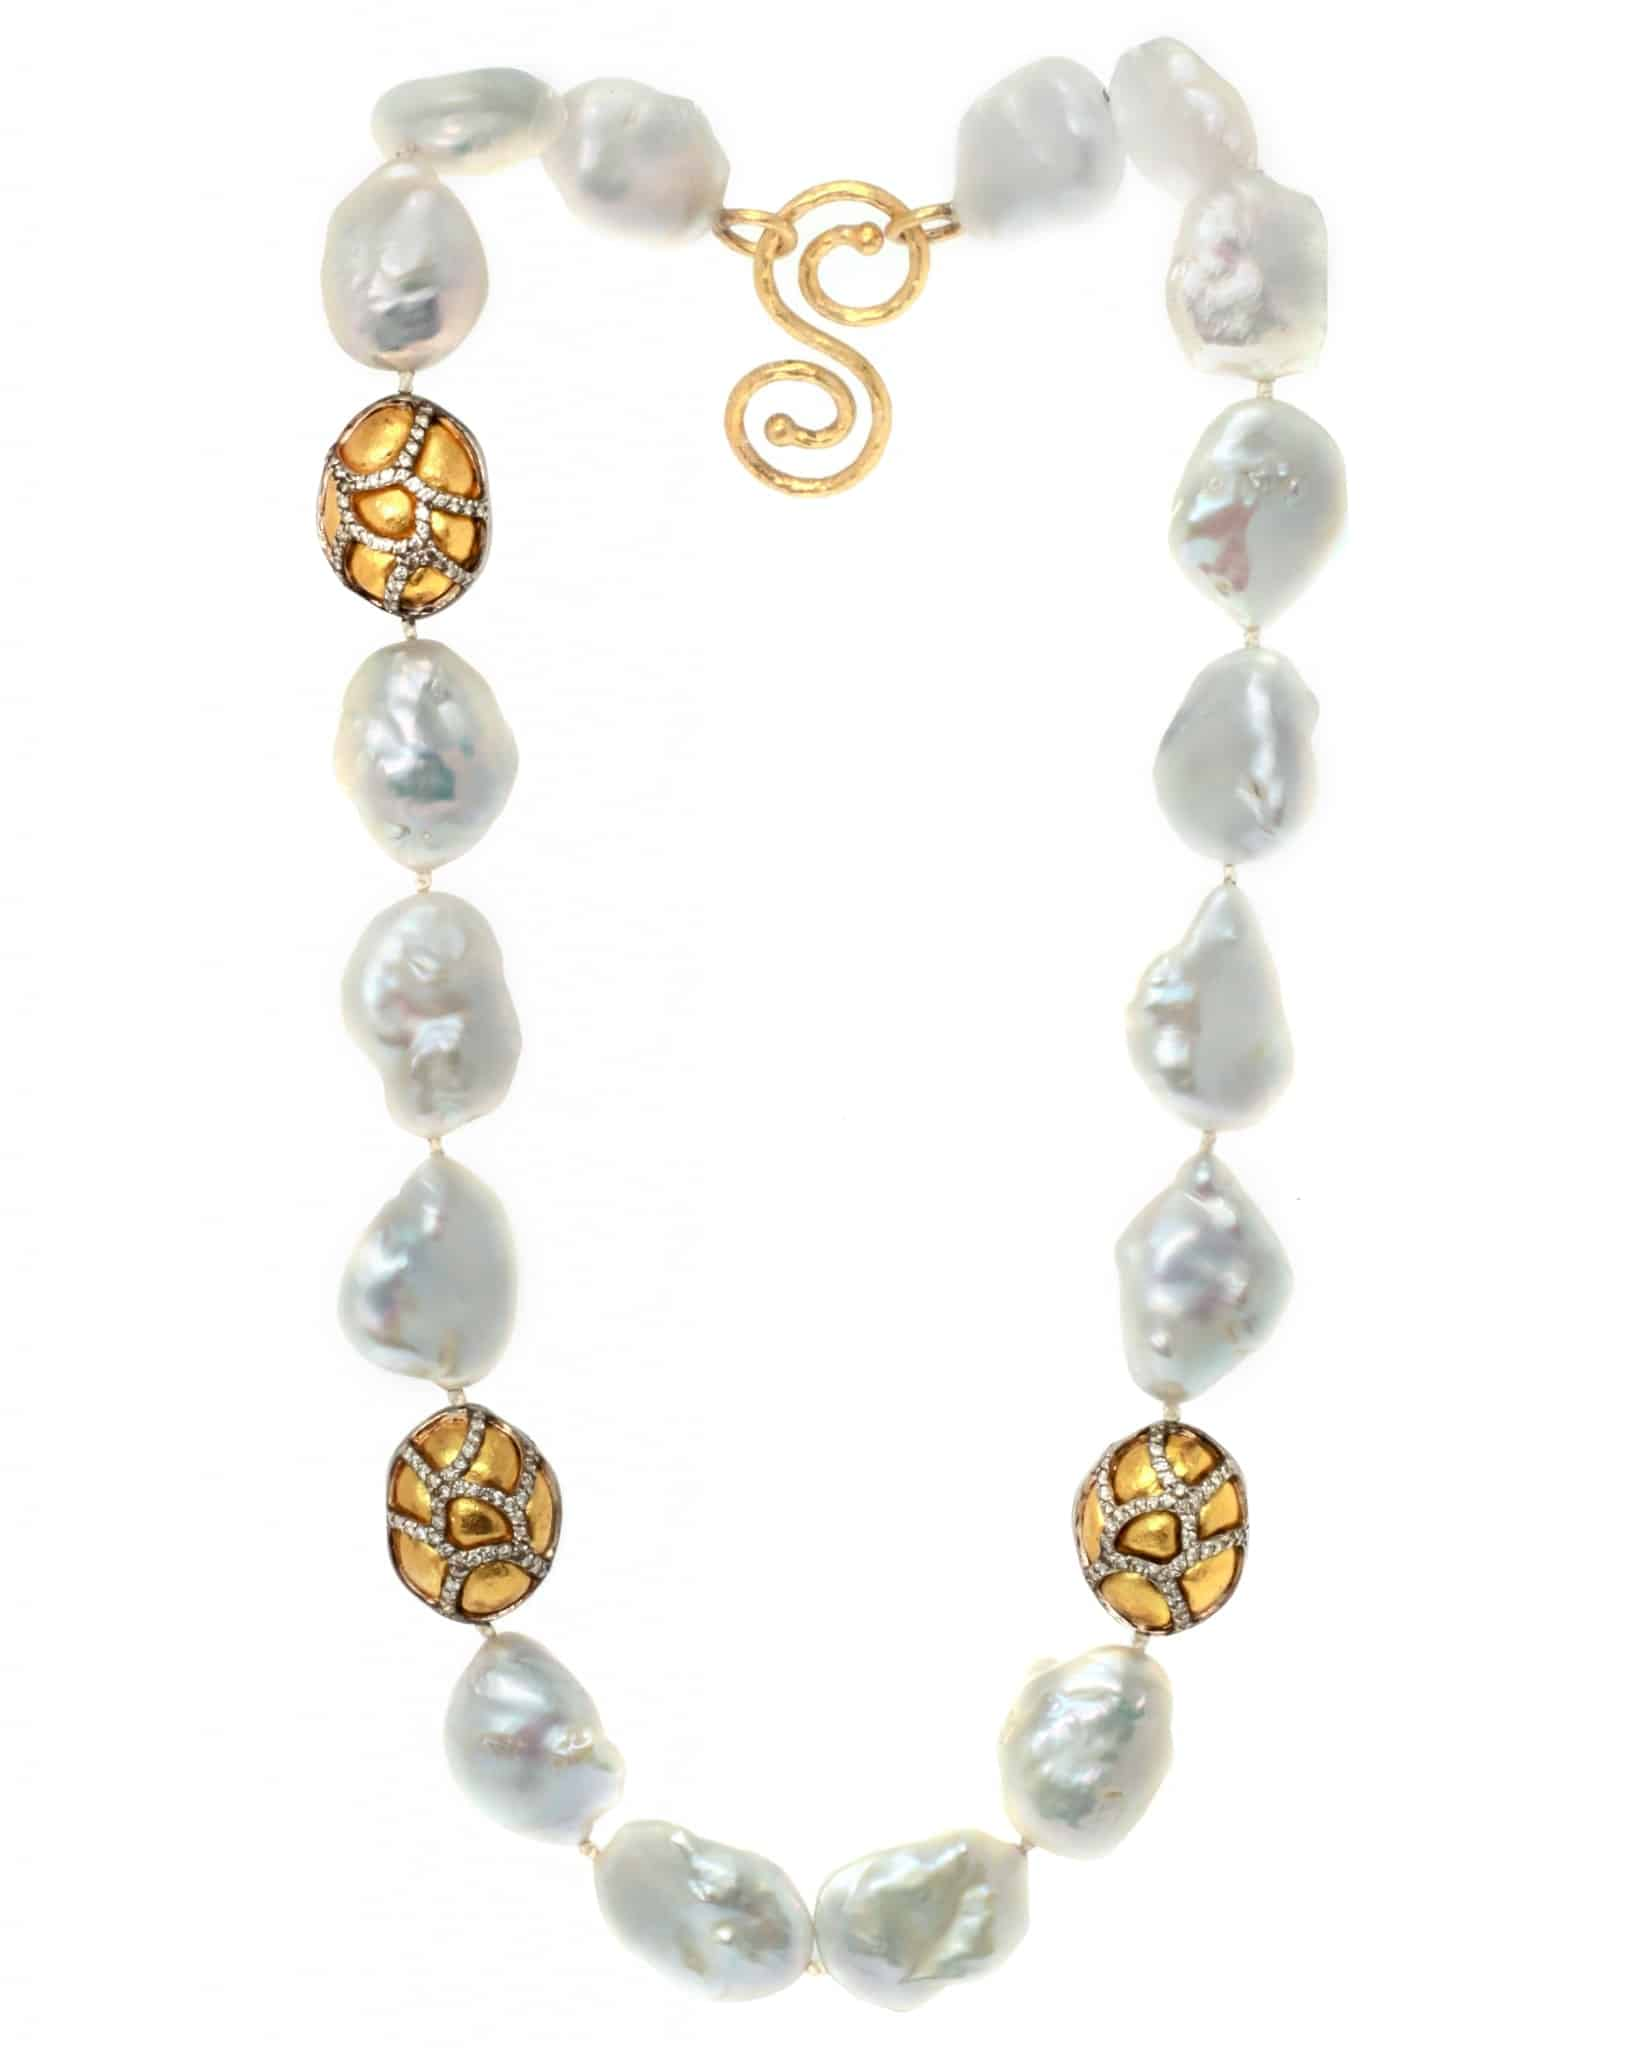 GURHAN Classic Gossamer Diamond Fresh Water Pearl Necklace N-WFWPB-3GOBDI-20